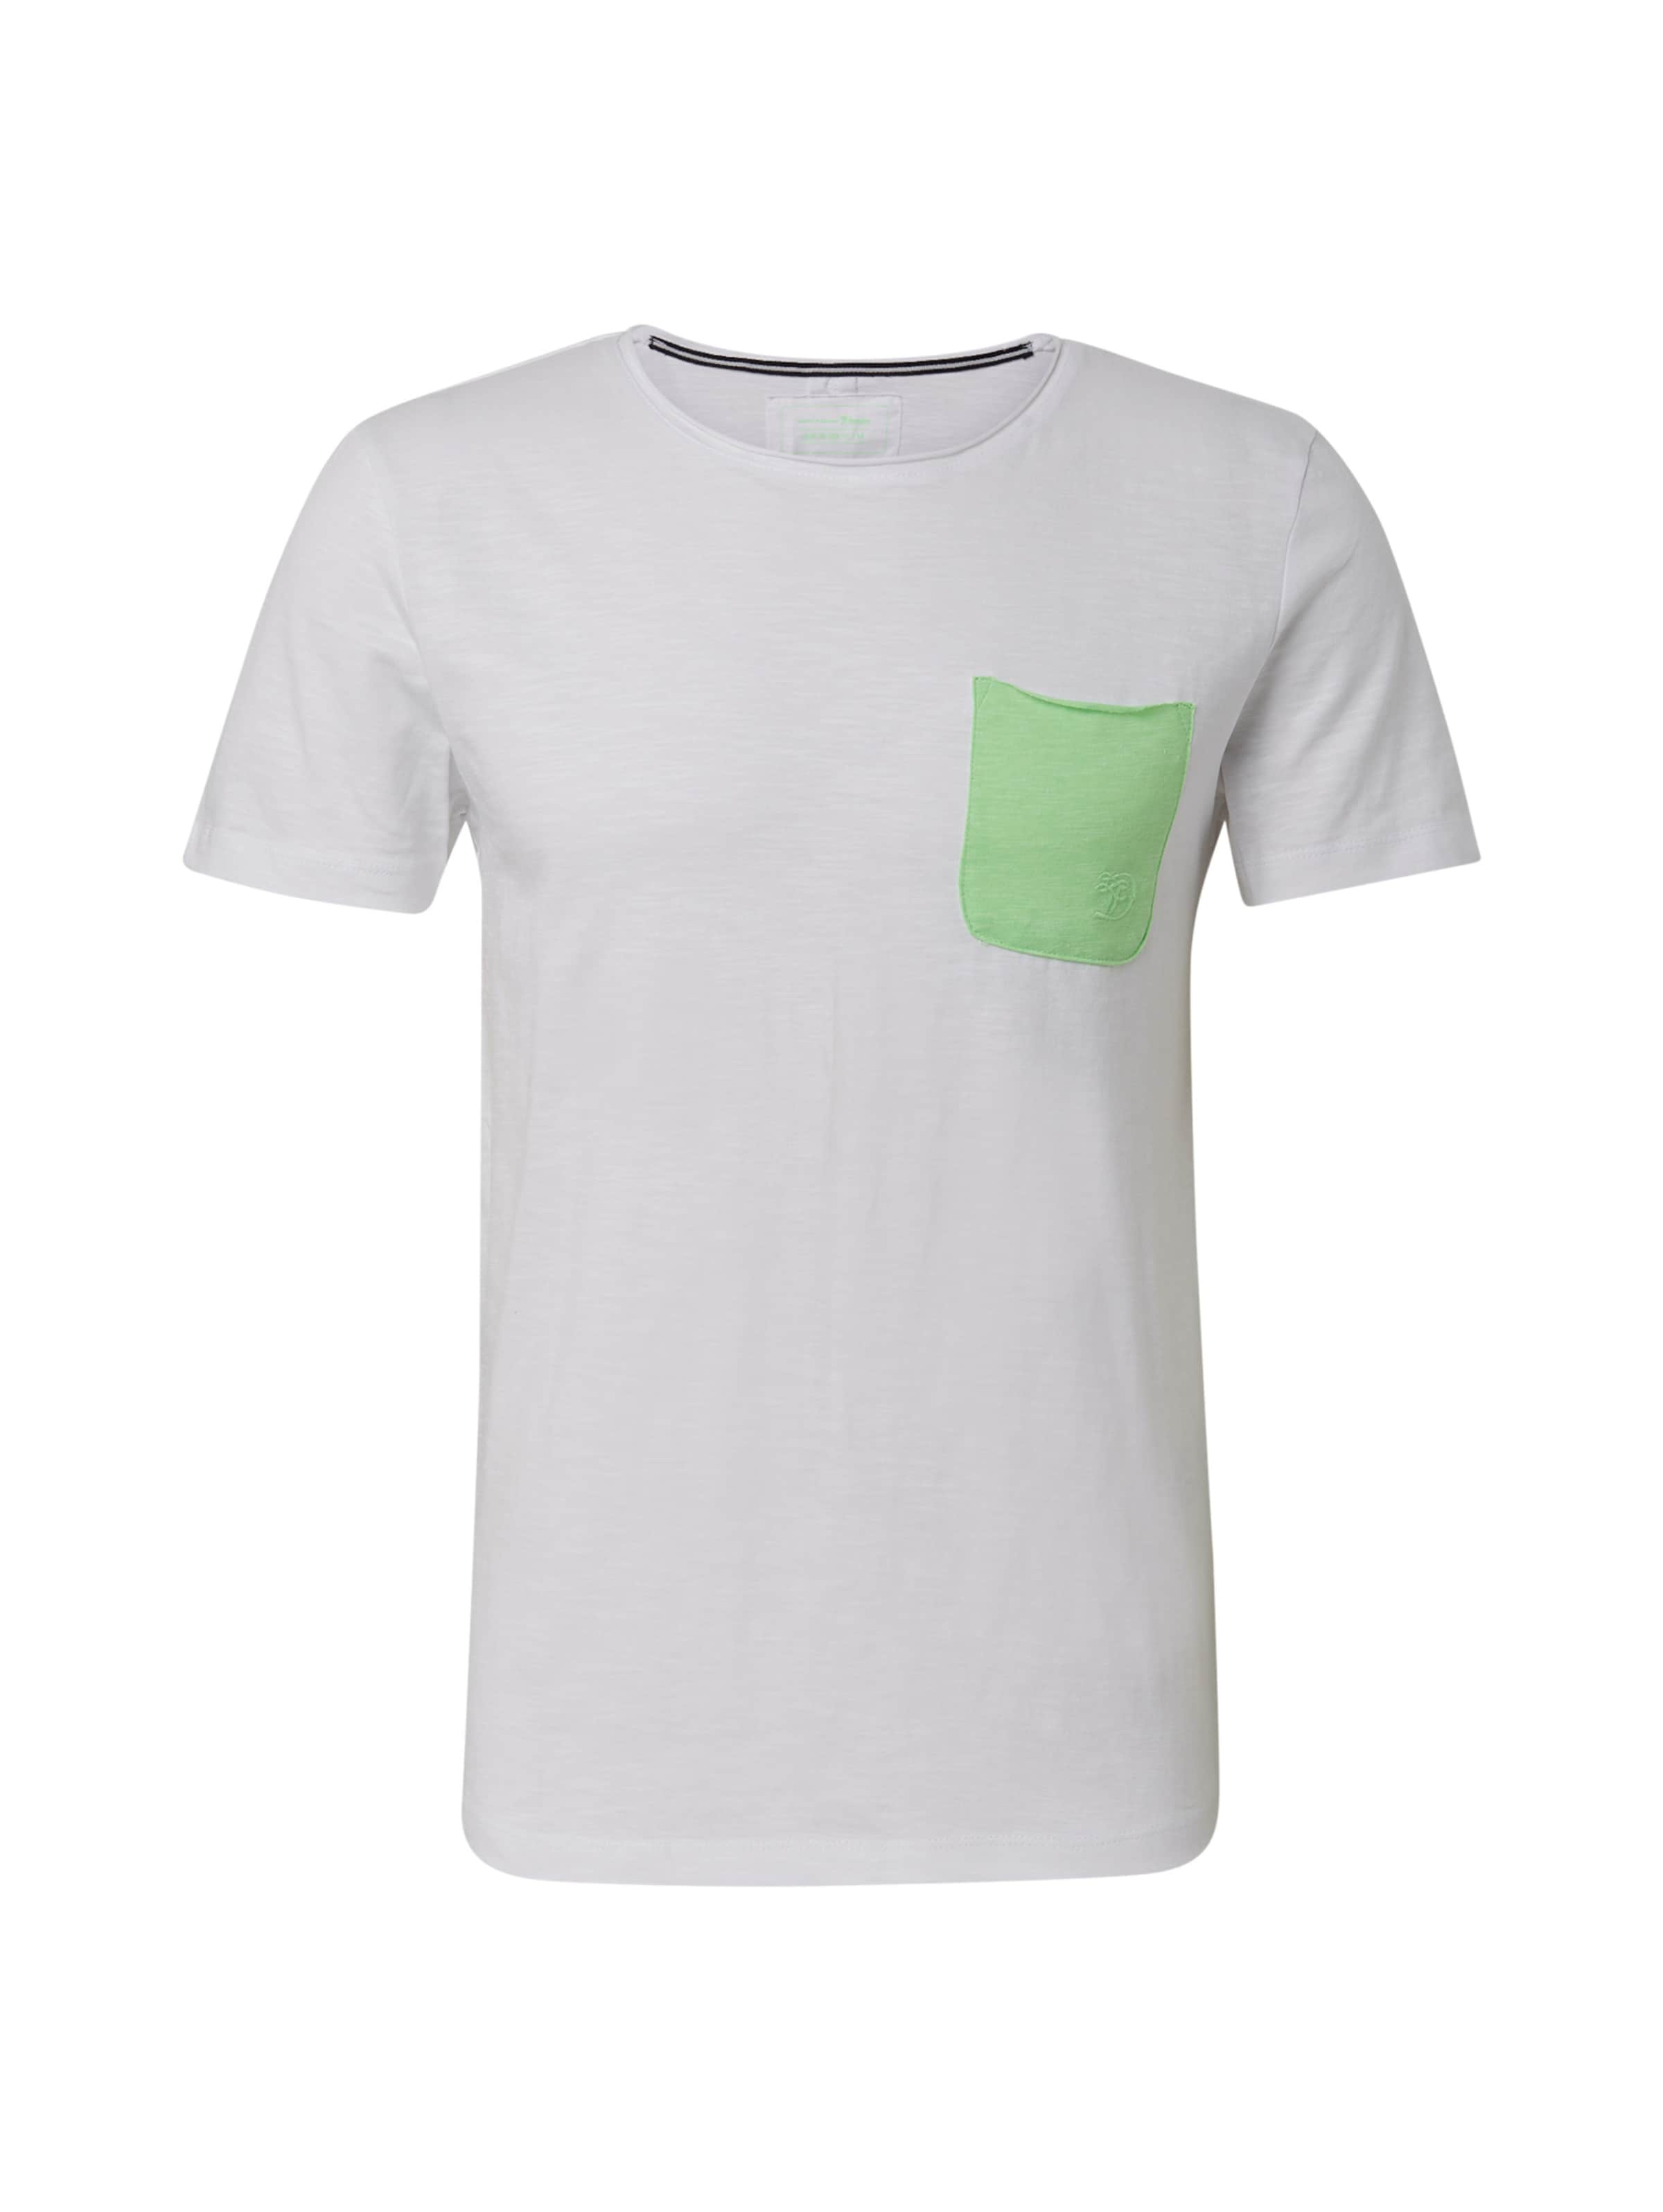 T GrünWeiß Denim In Tom Tailor shirt JuTFc3lK1